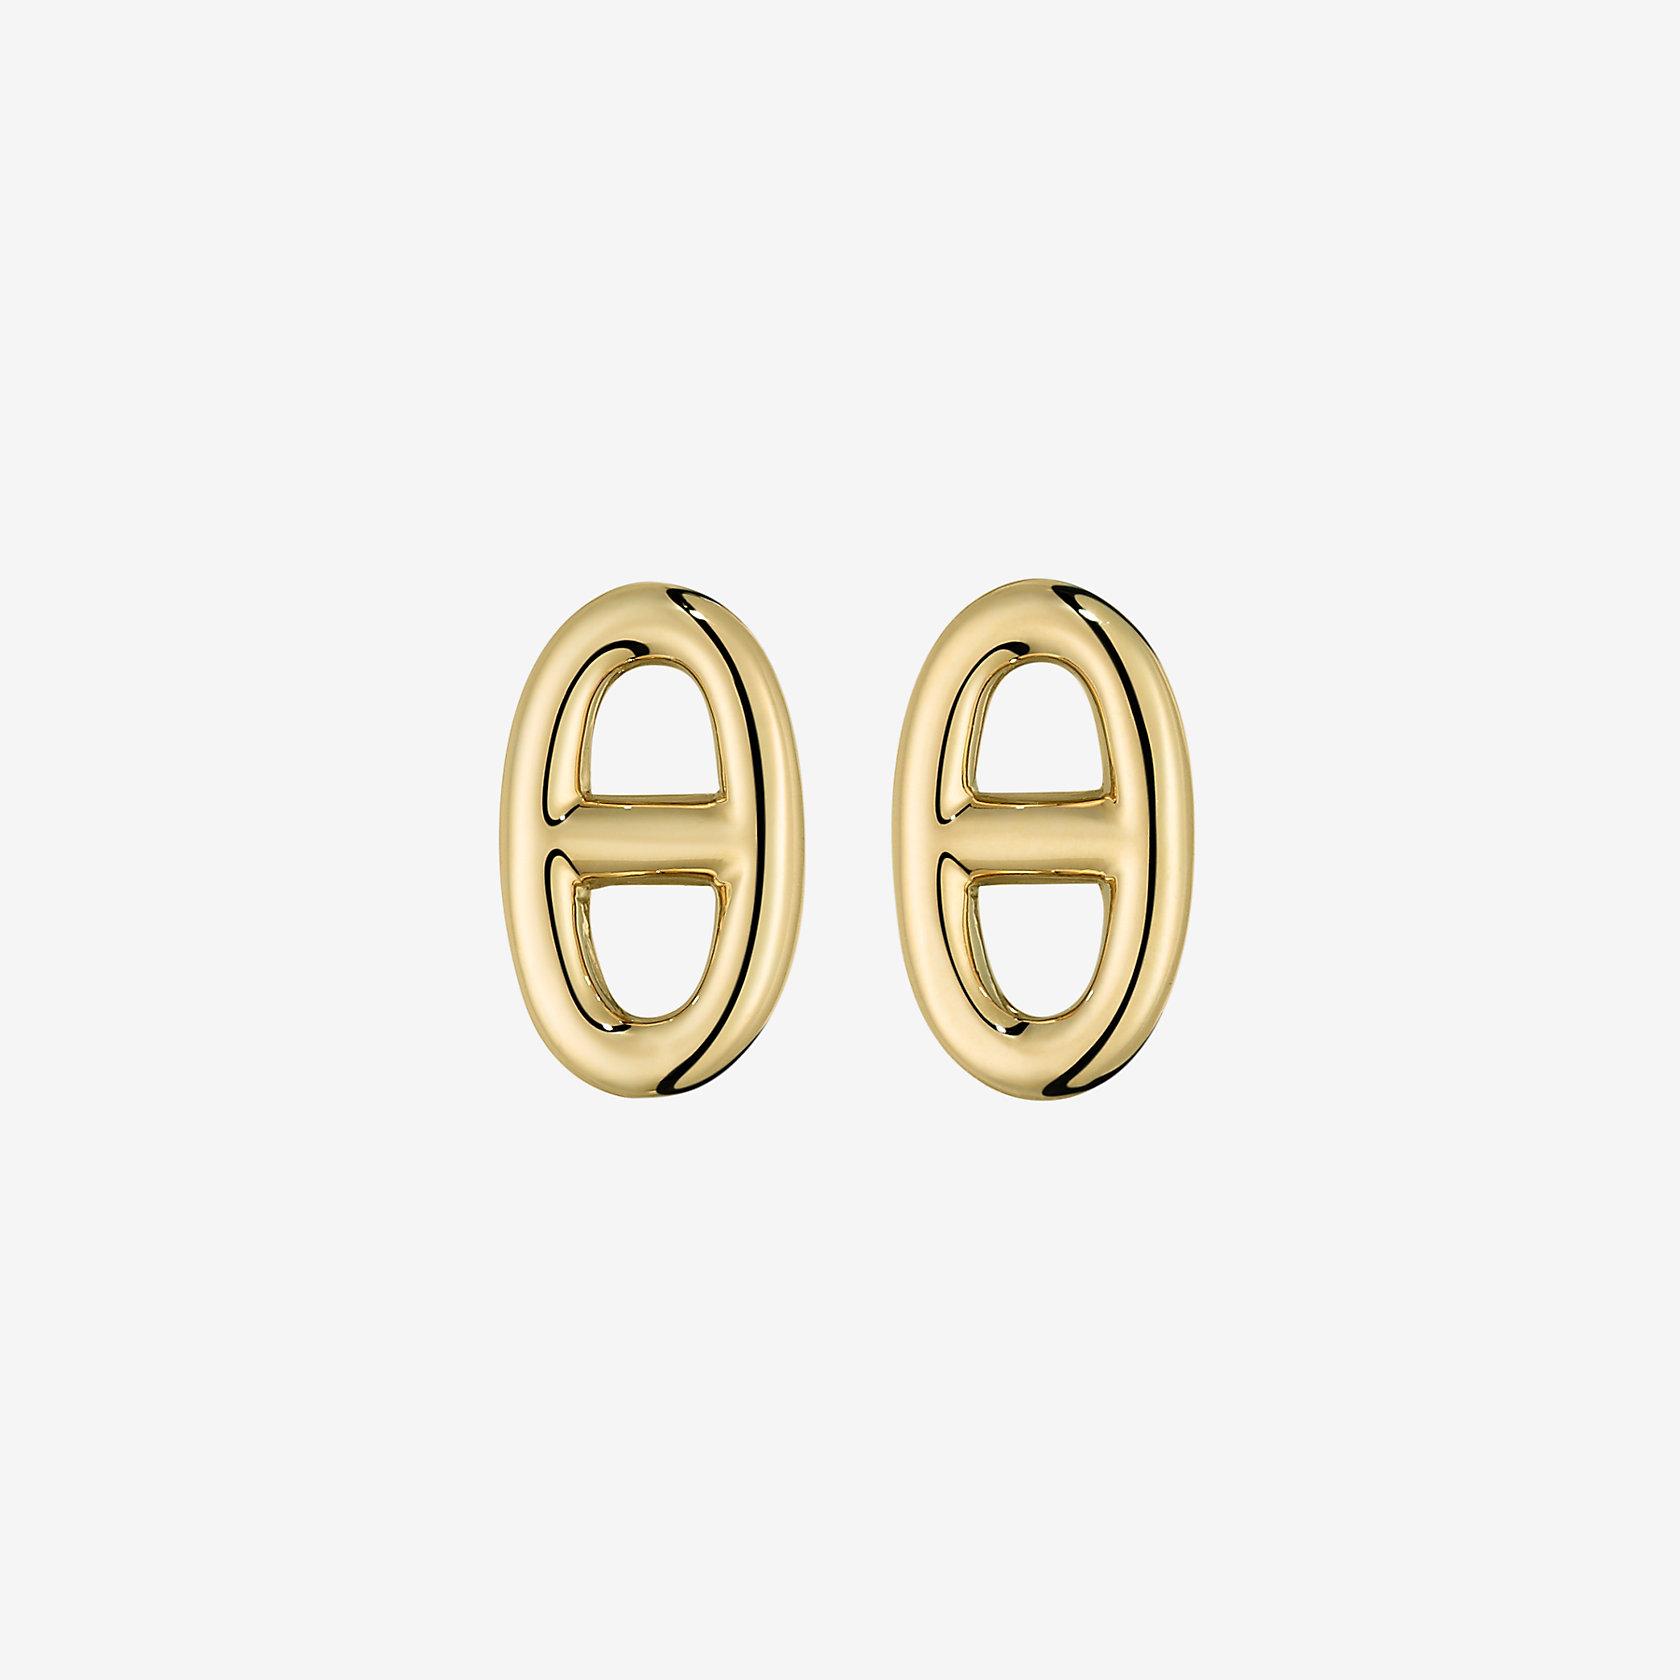 80163dde3 ... order chaine dancre earrings very small model hermès 278be c49a6